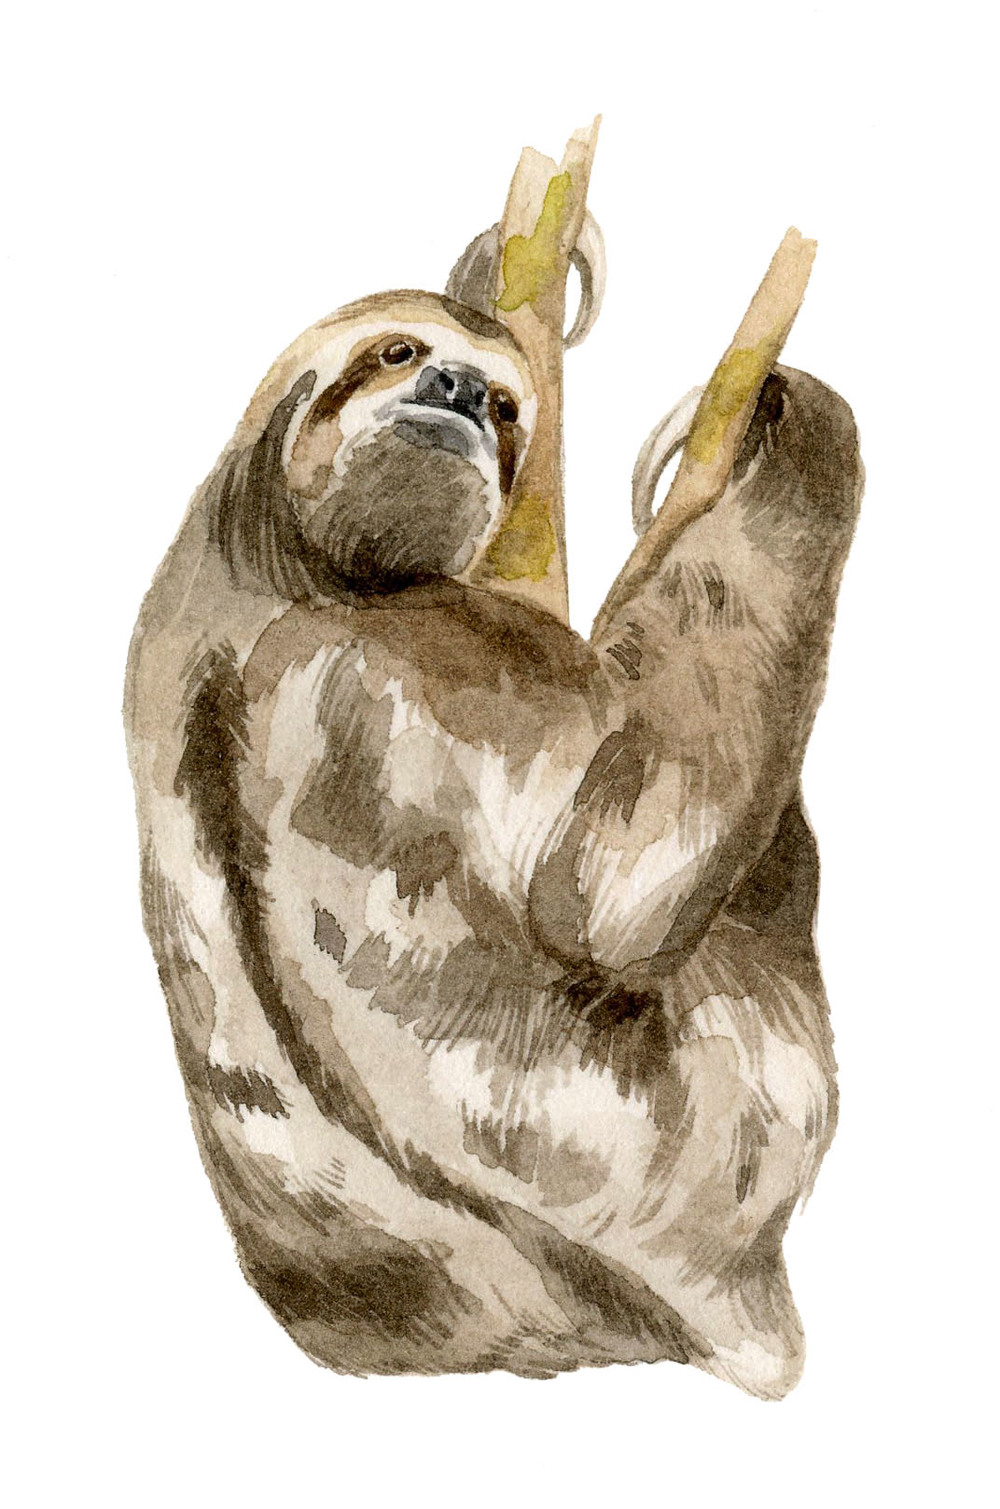 sloth-lrg.jpg